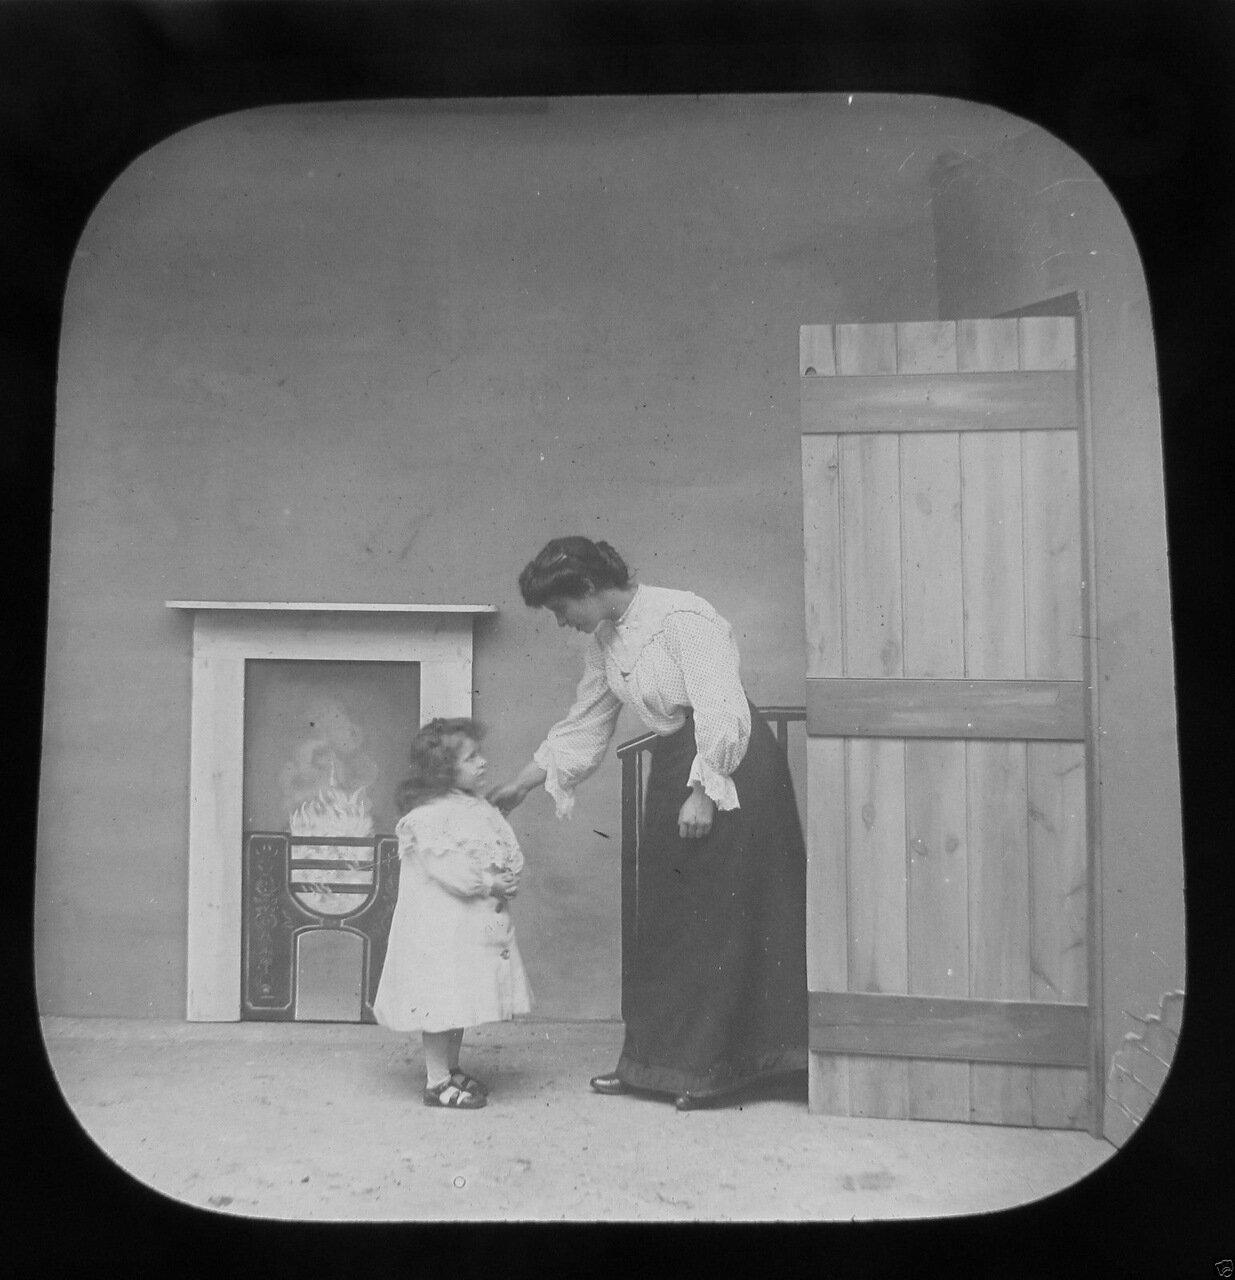 03. Джордж Мадден Мартин «Ангел многоквартирного дома». 1909